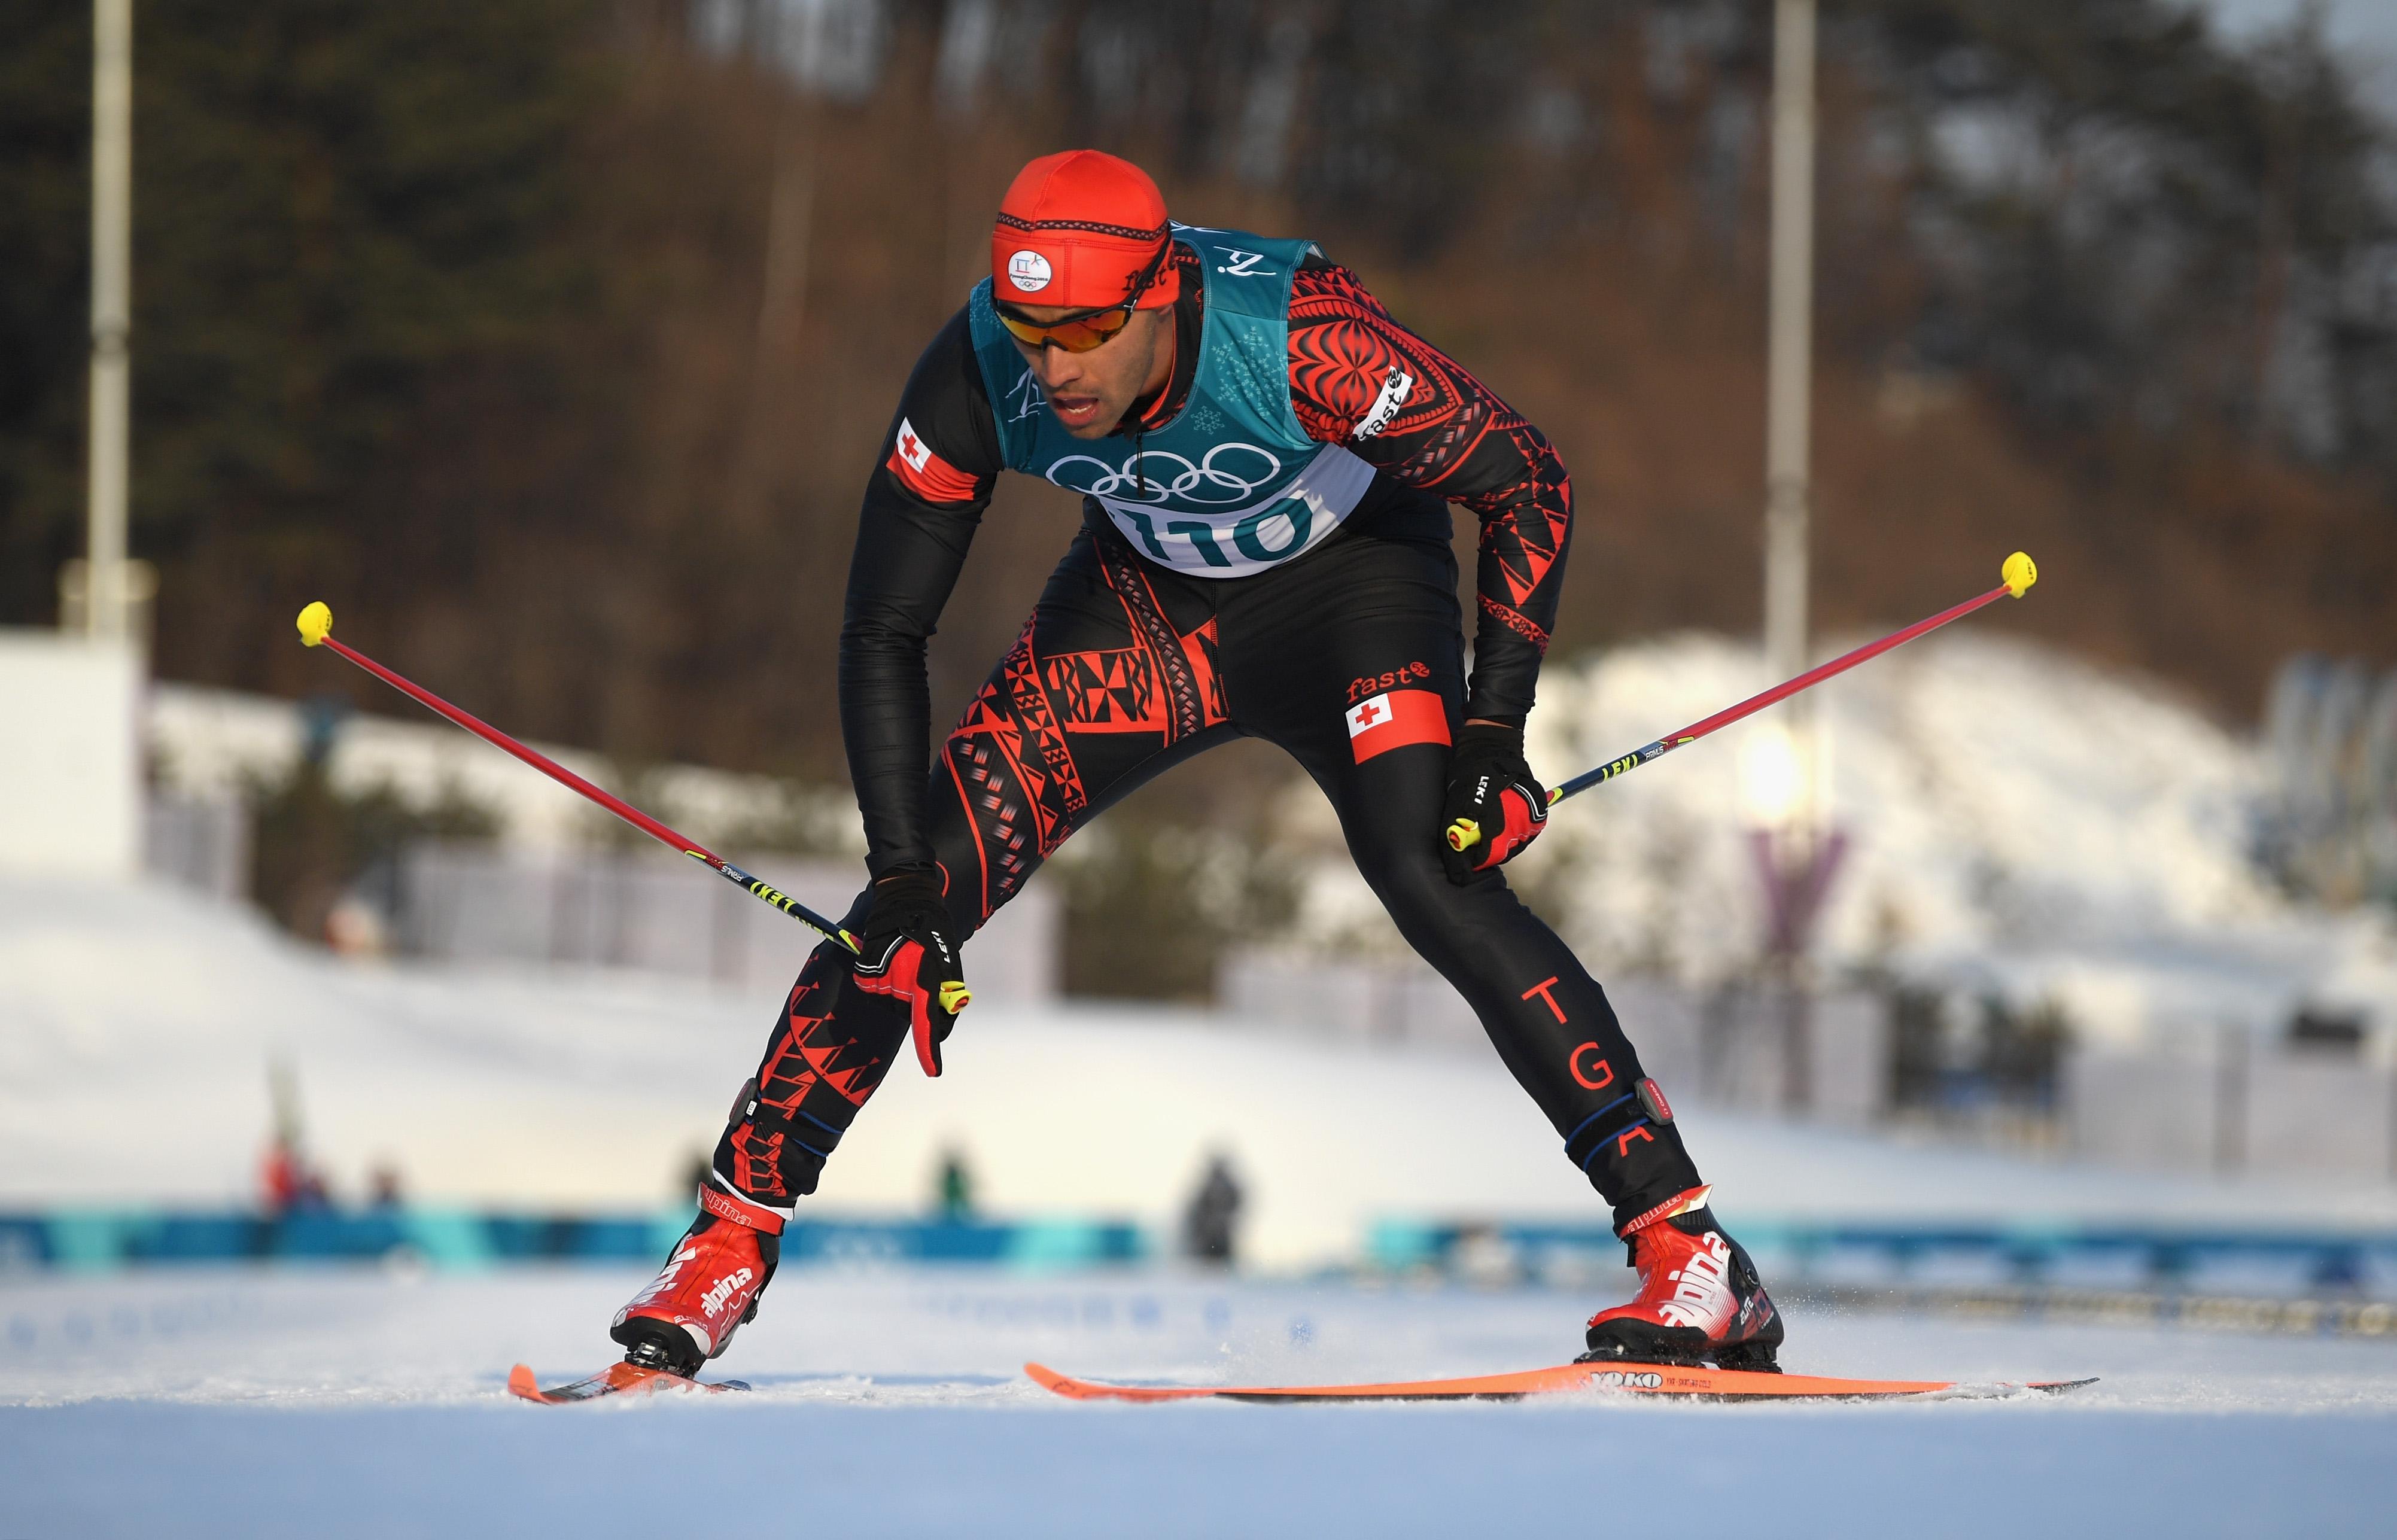 PYEONGCHANG-GUN, SOUTH KOREA - FEBRUARY 16:  Pita Taufatofua of Tonga crosses the finish line during the Cross-Country Skiing Men's 15km Free at Alpensia Cross-Country Centre on February 16, 2018 in Pyeongchang-gun, South Korea.  (Photo by...